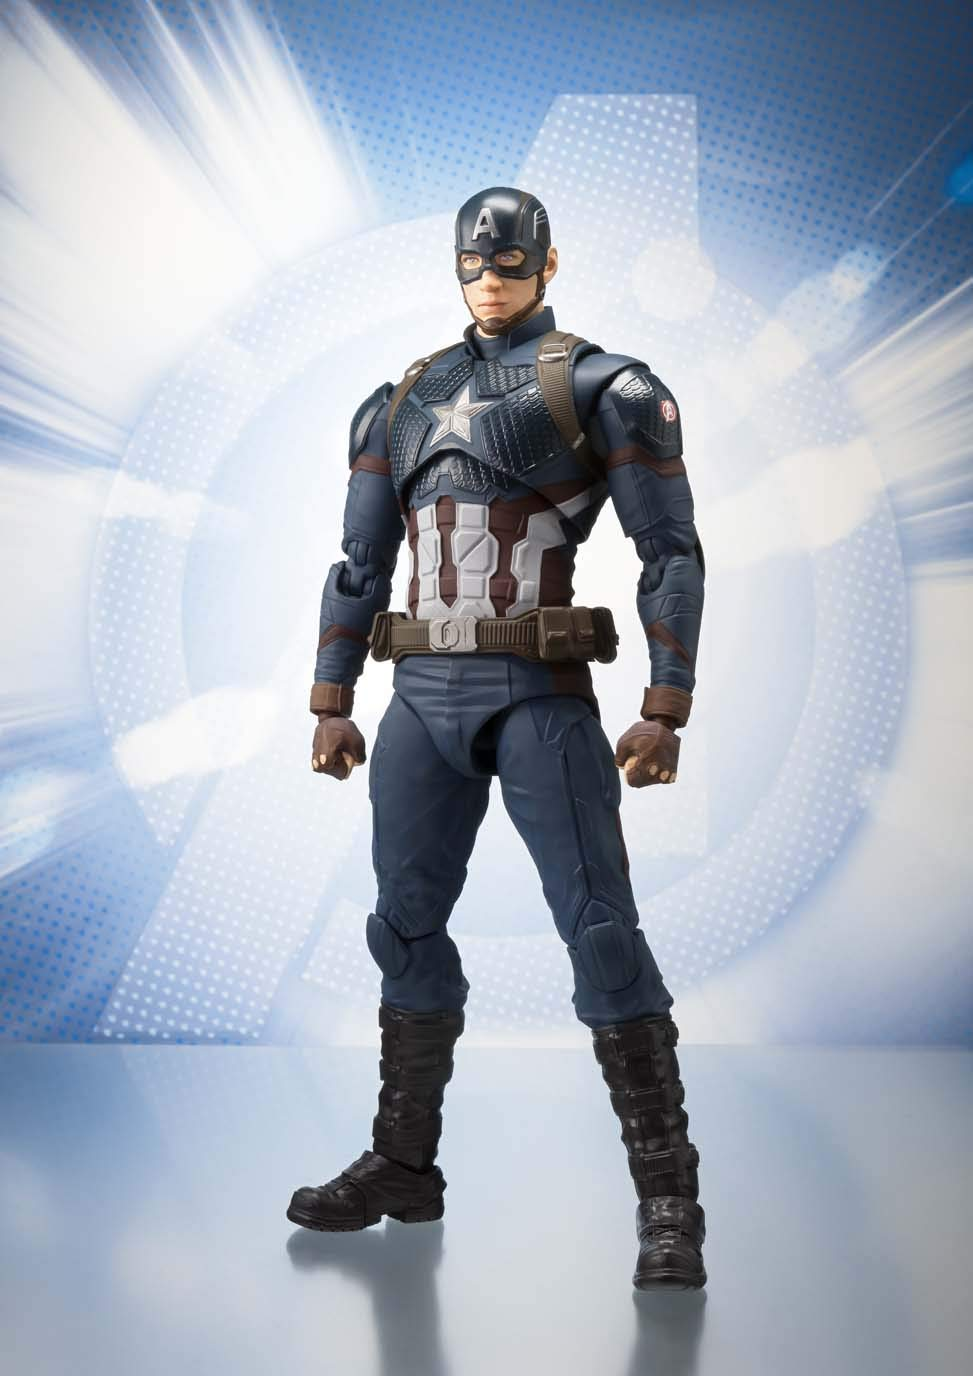 S.H.Figuarts Marvel Avengers 4 End Game Captain America SHF Action Figure